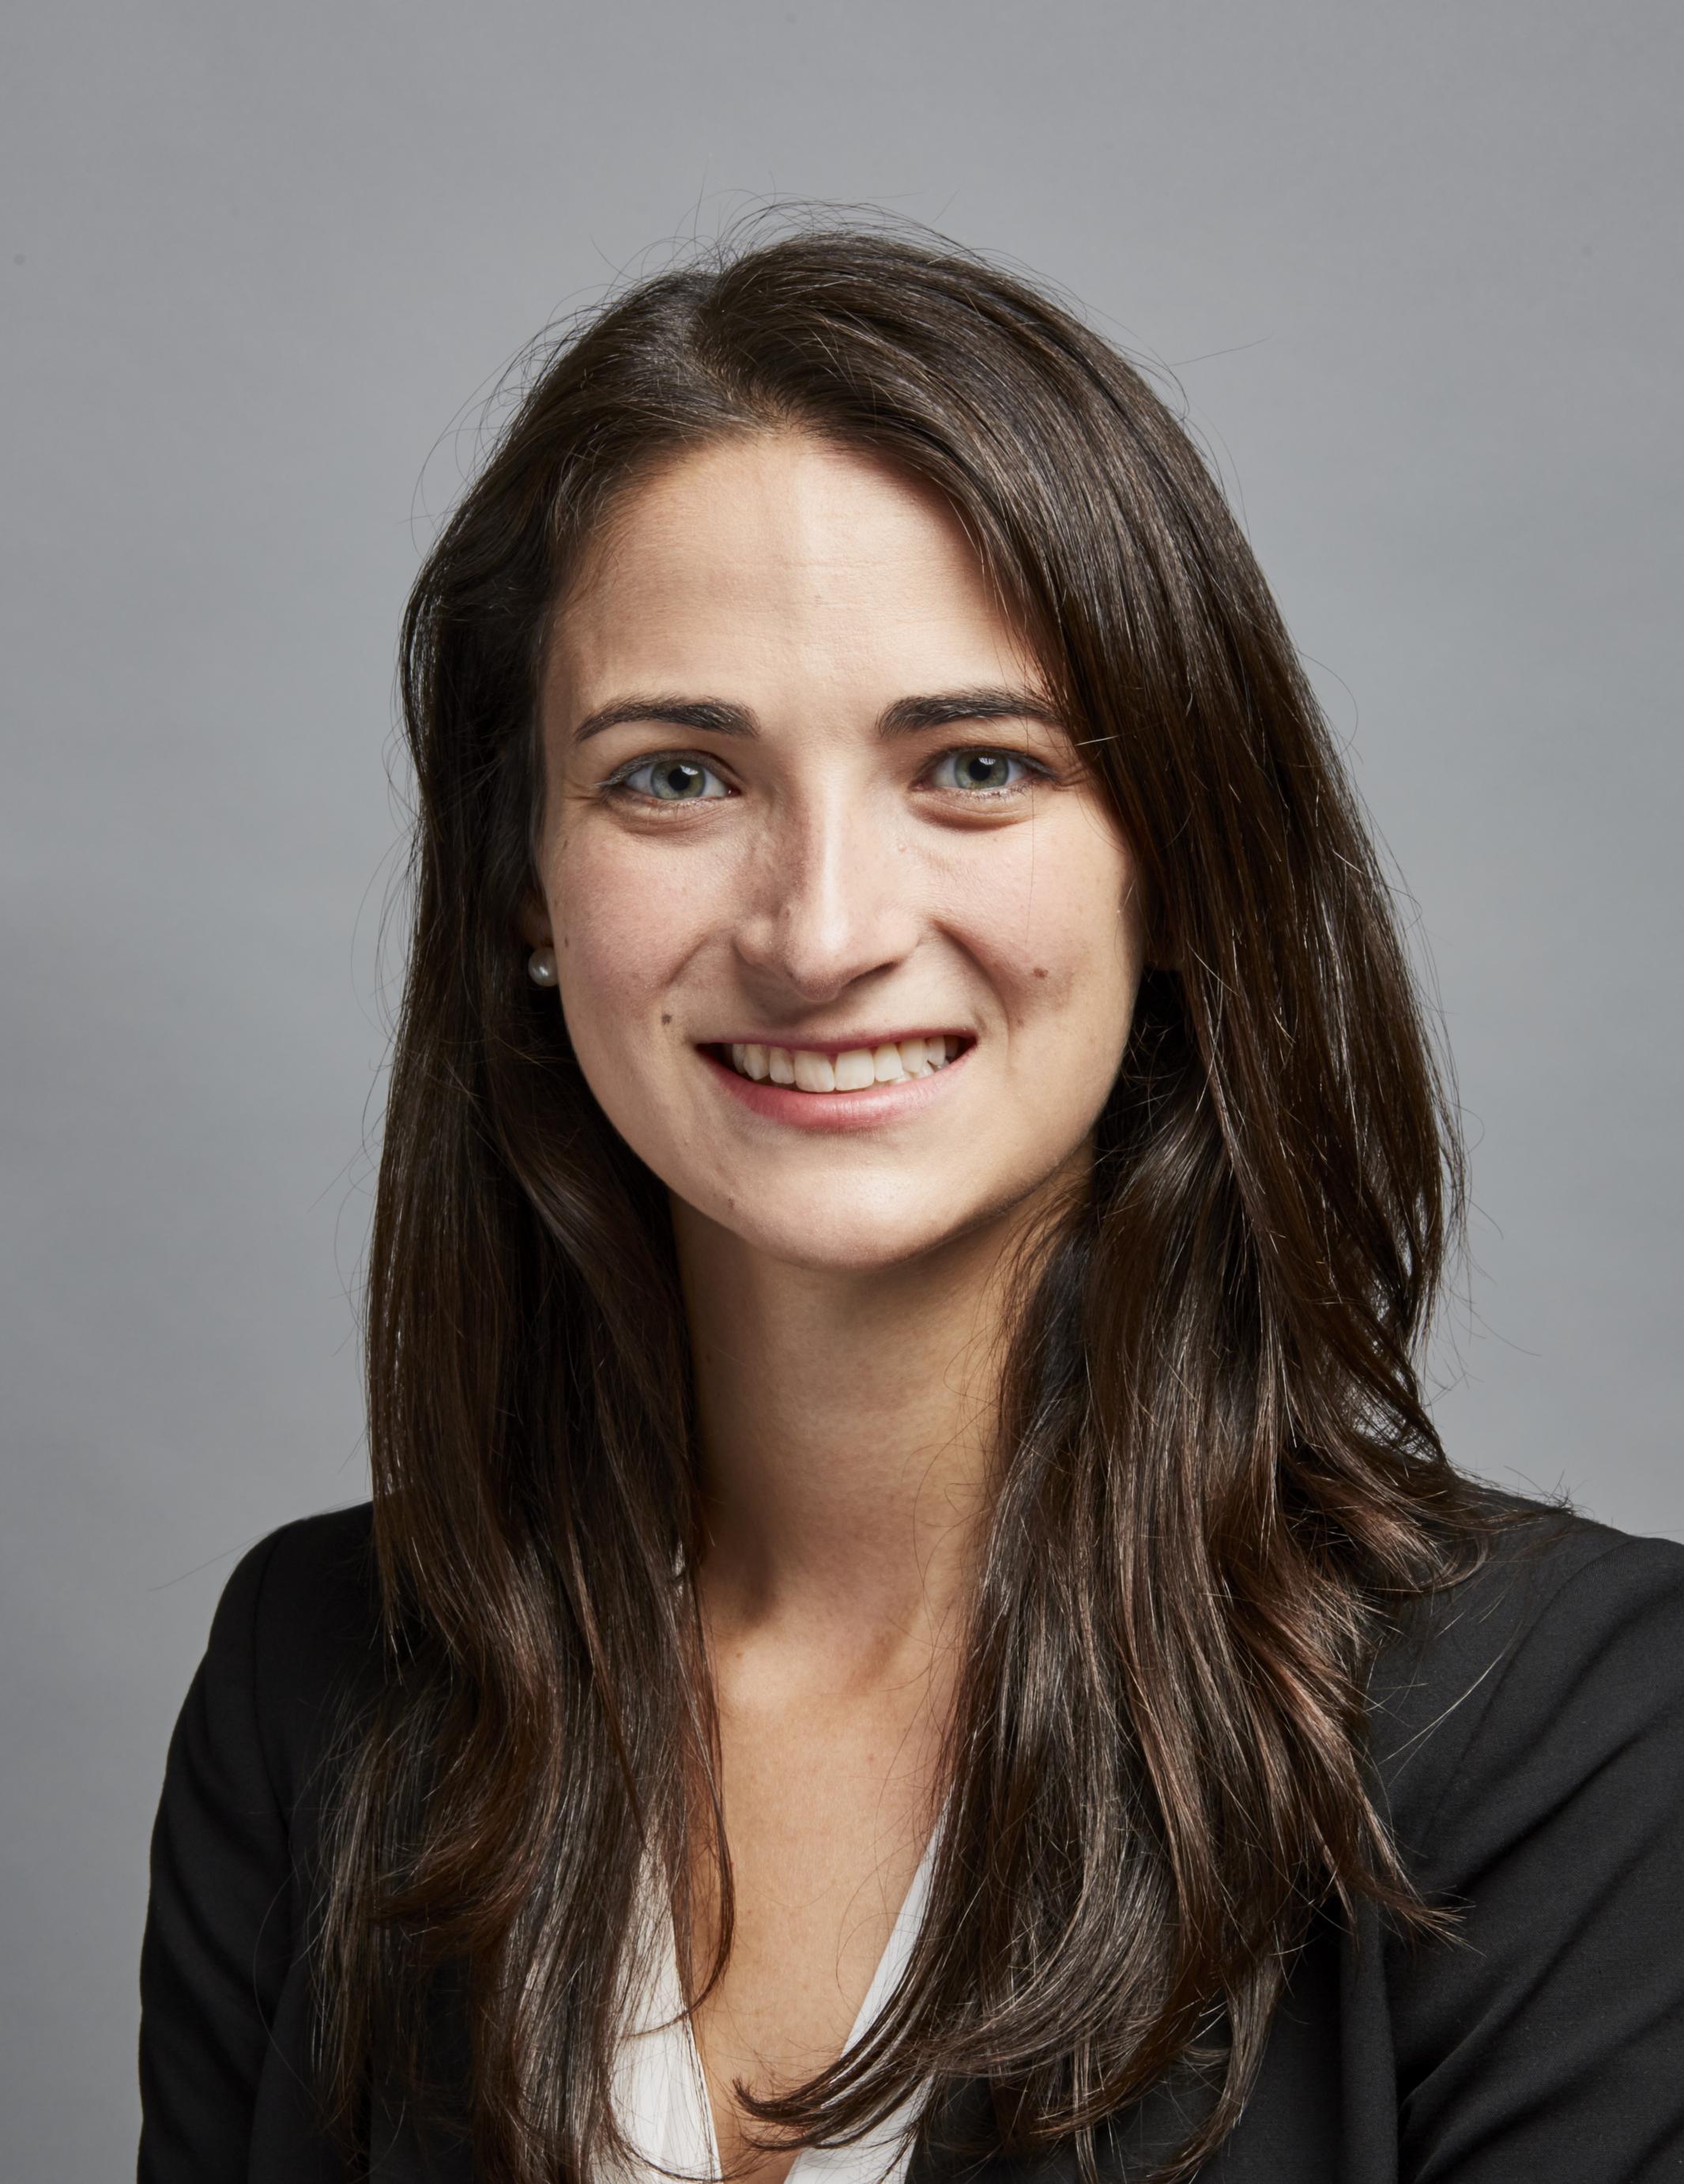 Renee Kroner